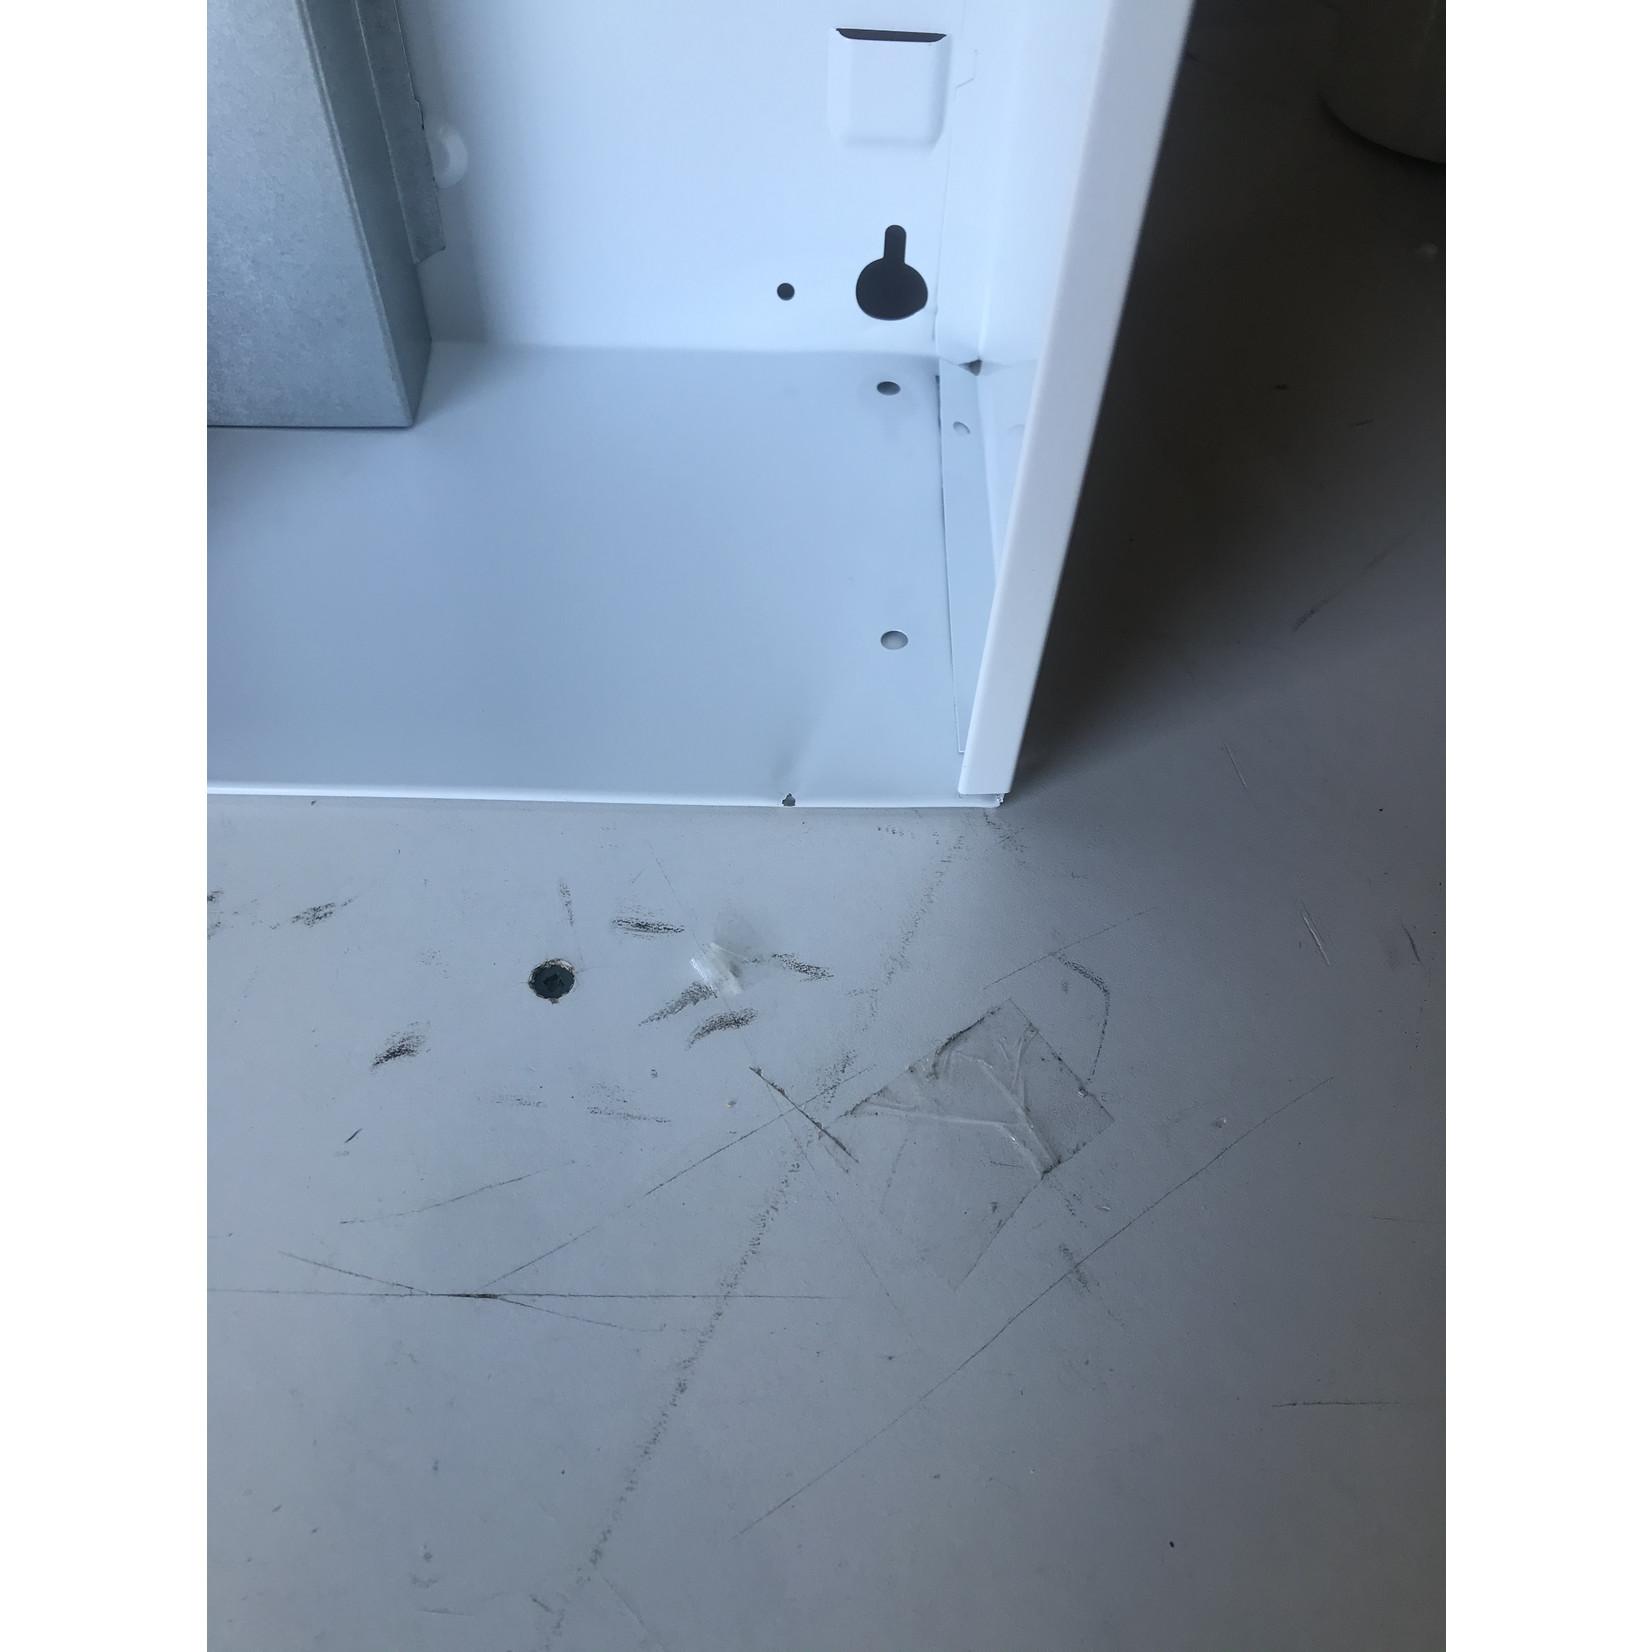 "*30"" 42000 Series 190 CFM Ducted Under Cabinet Range Hood - White - Slight Damage"